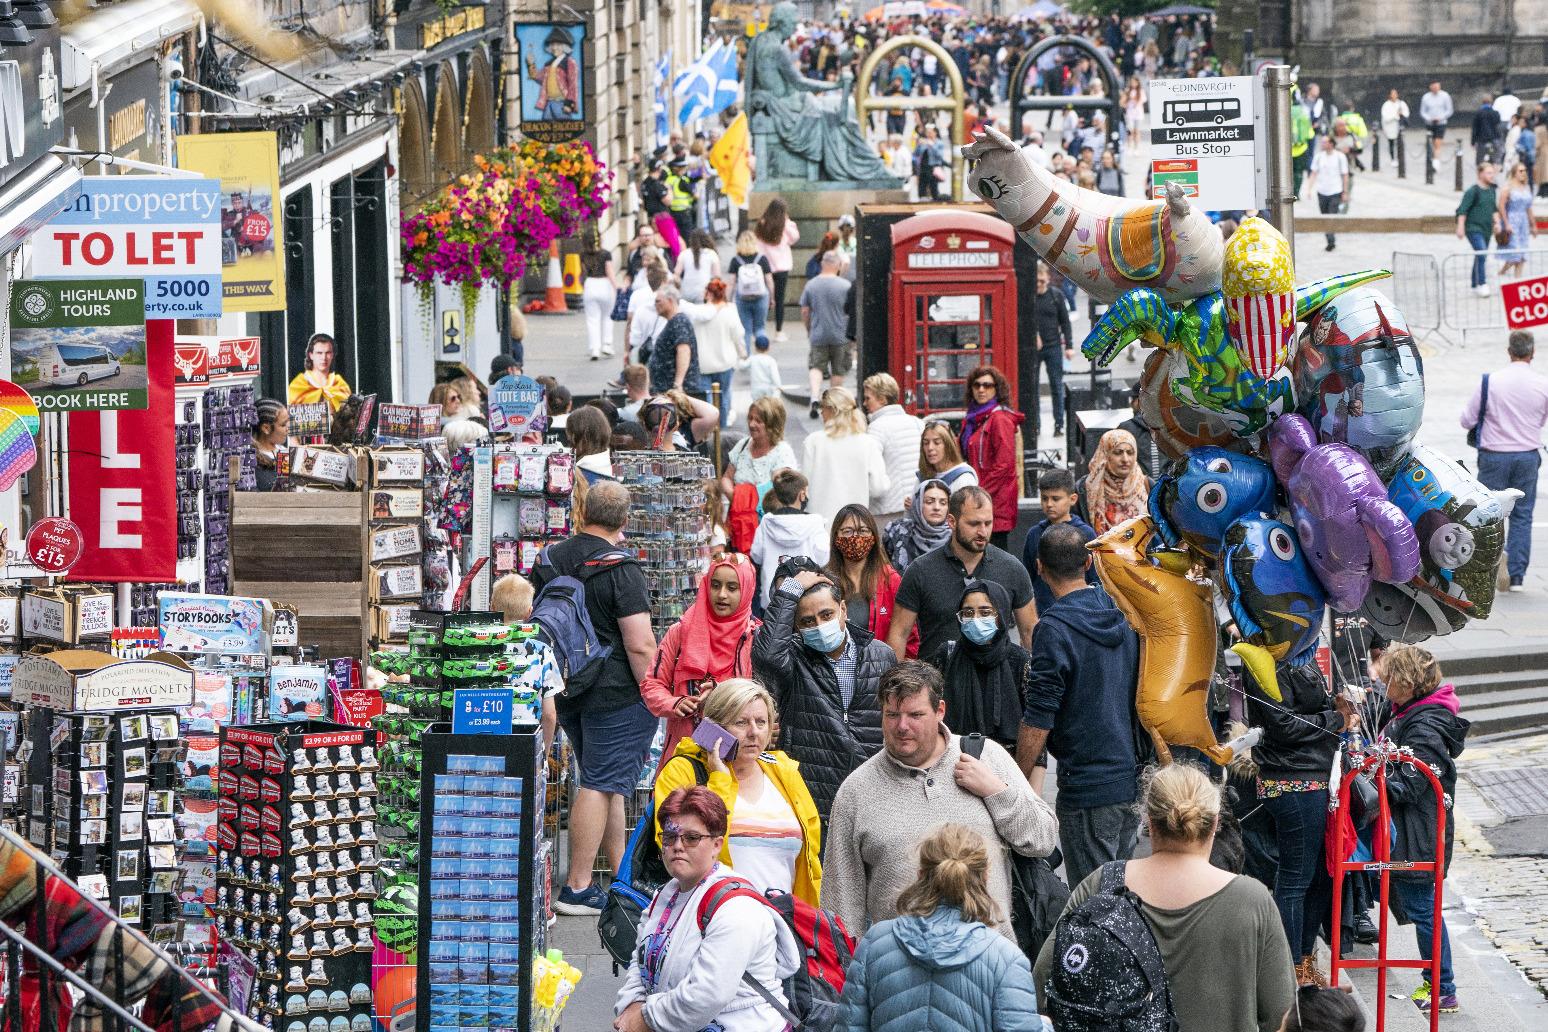 Edinburgh Festival Fringe returns after Covid cancellation